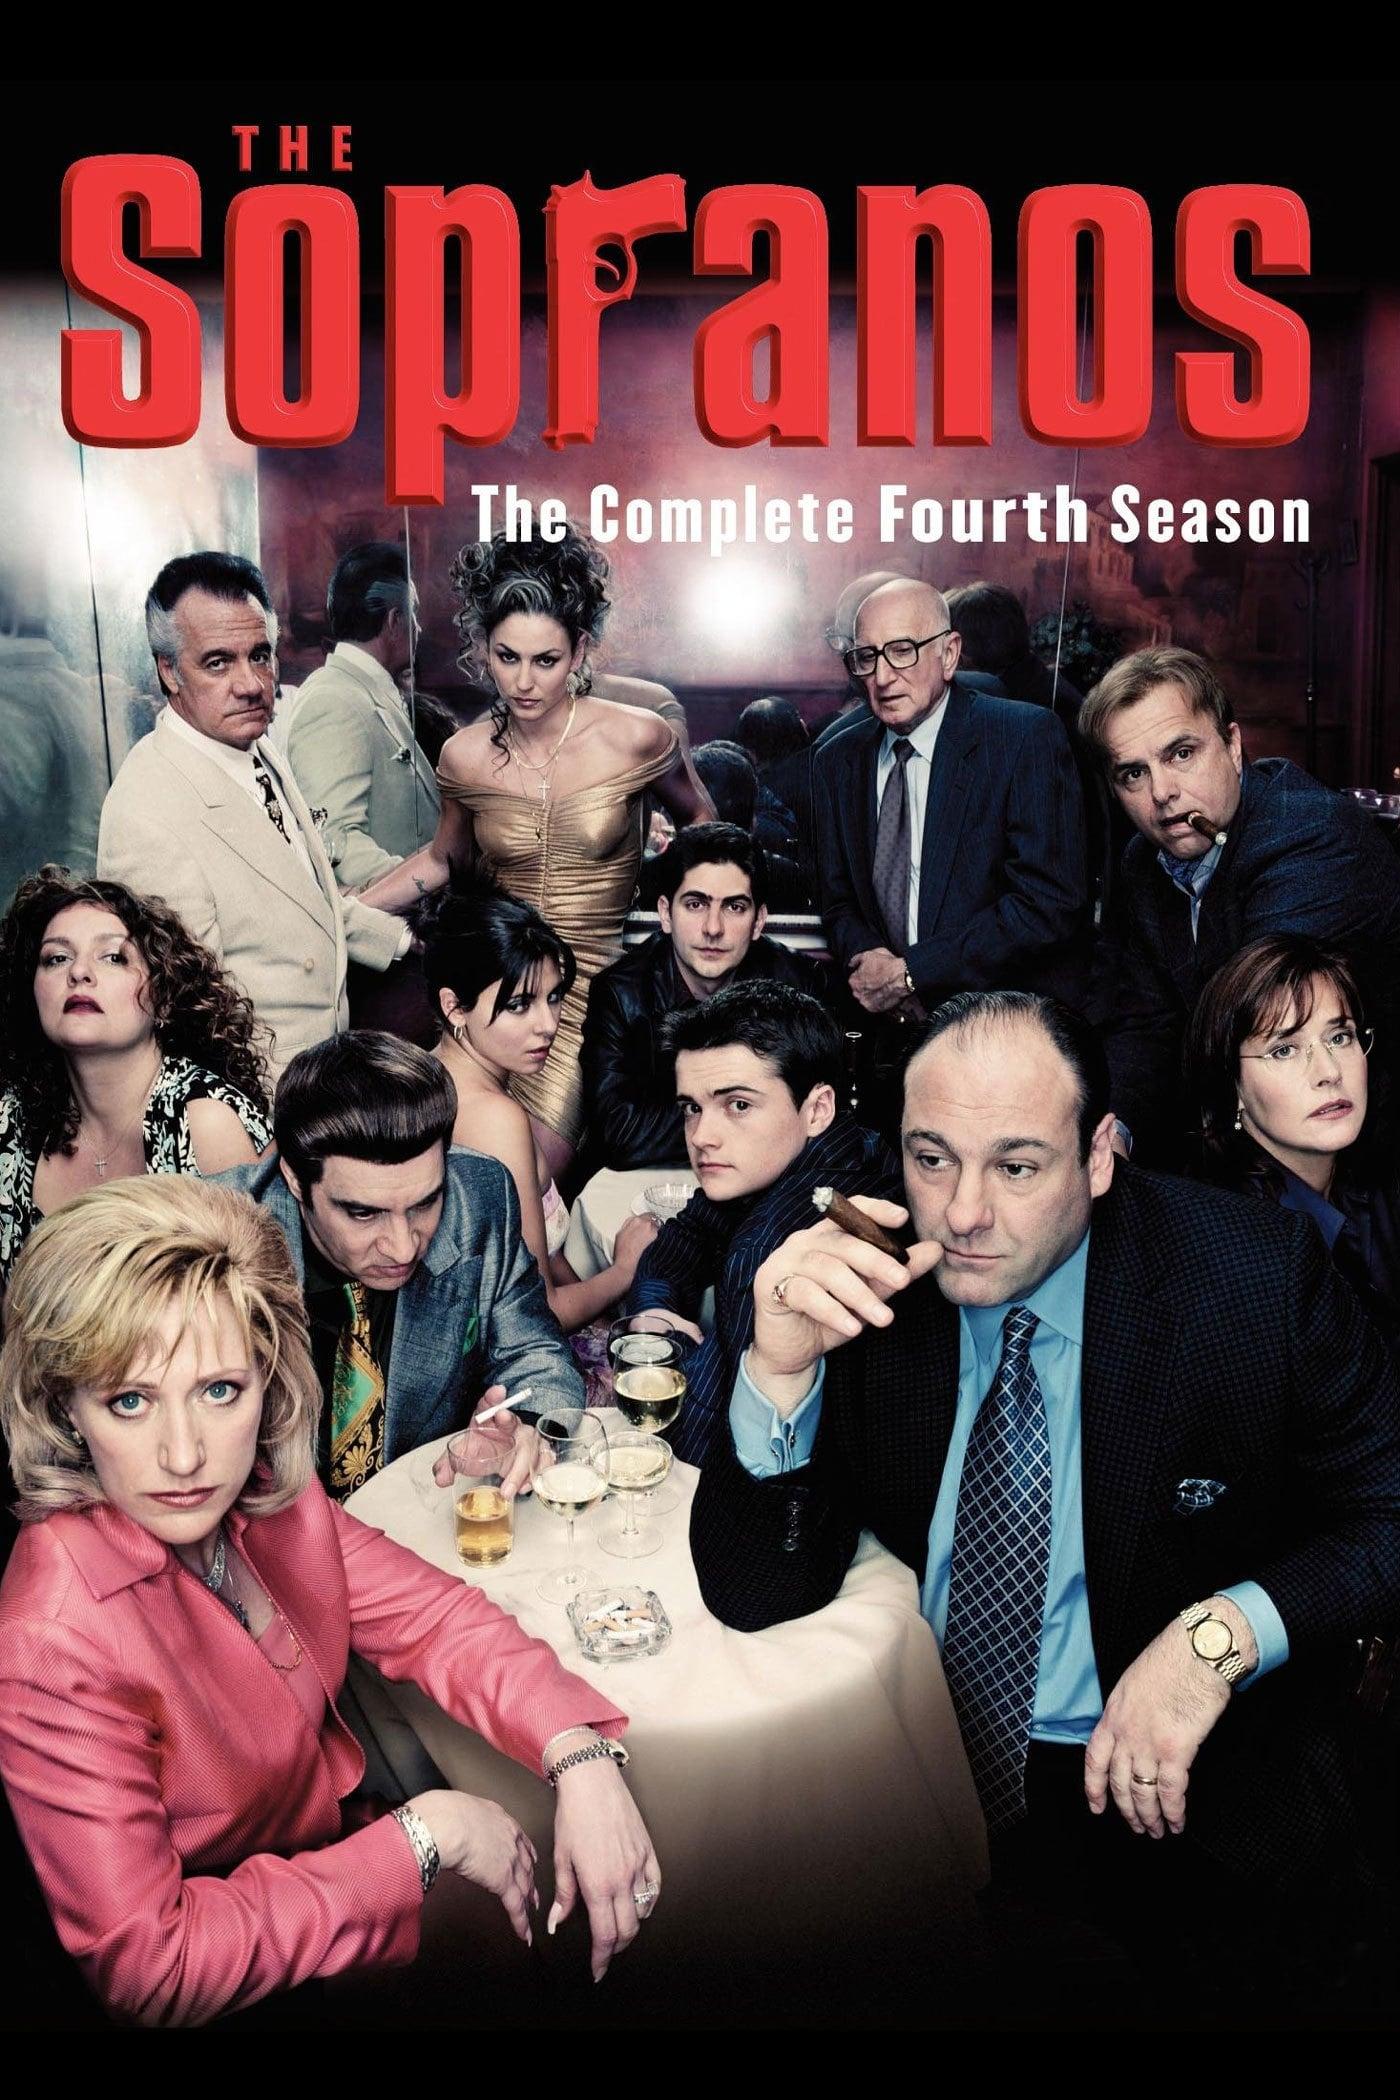 The Sopranos Season 4